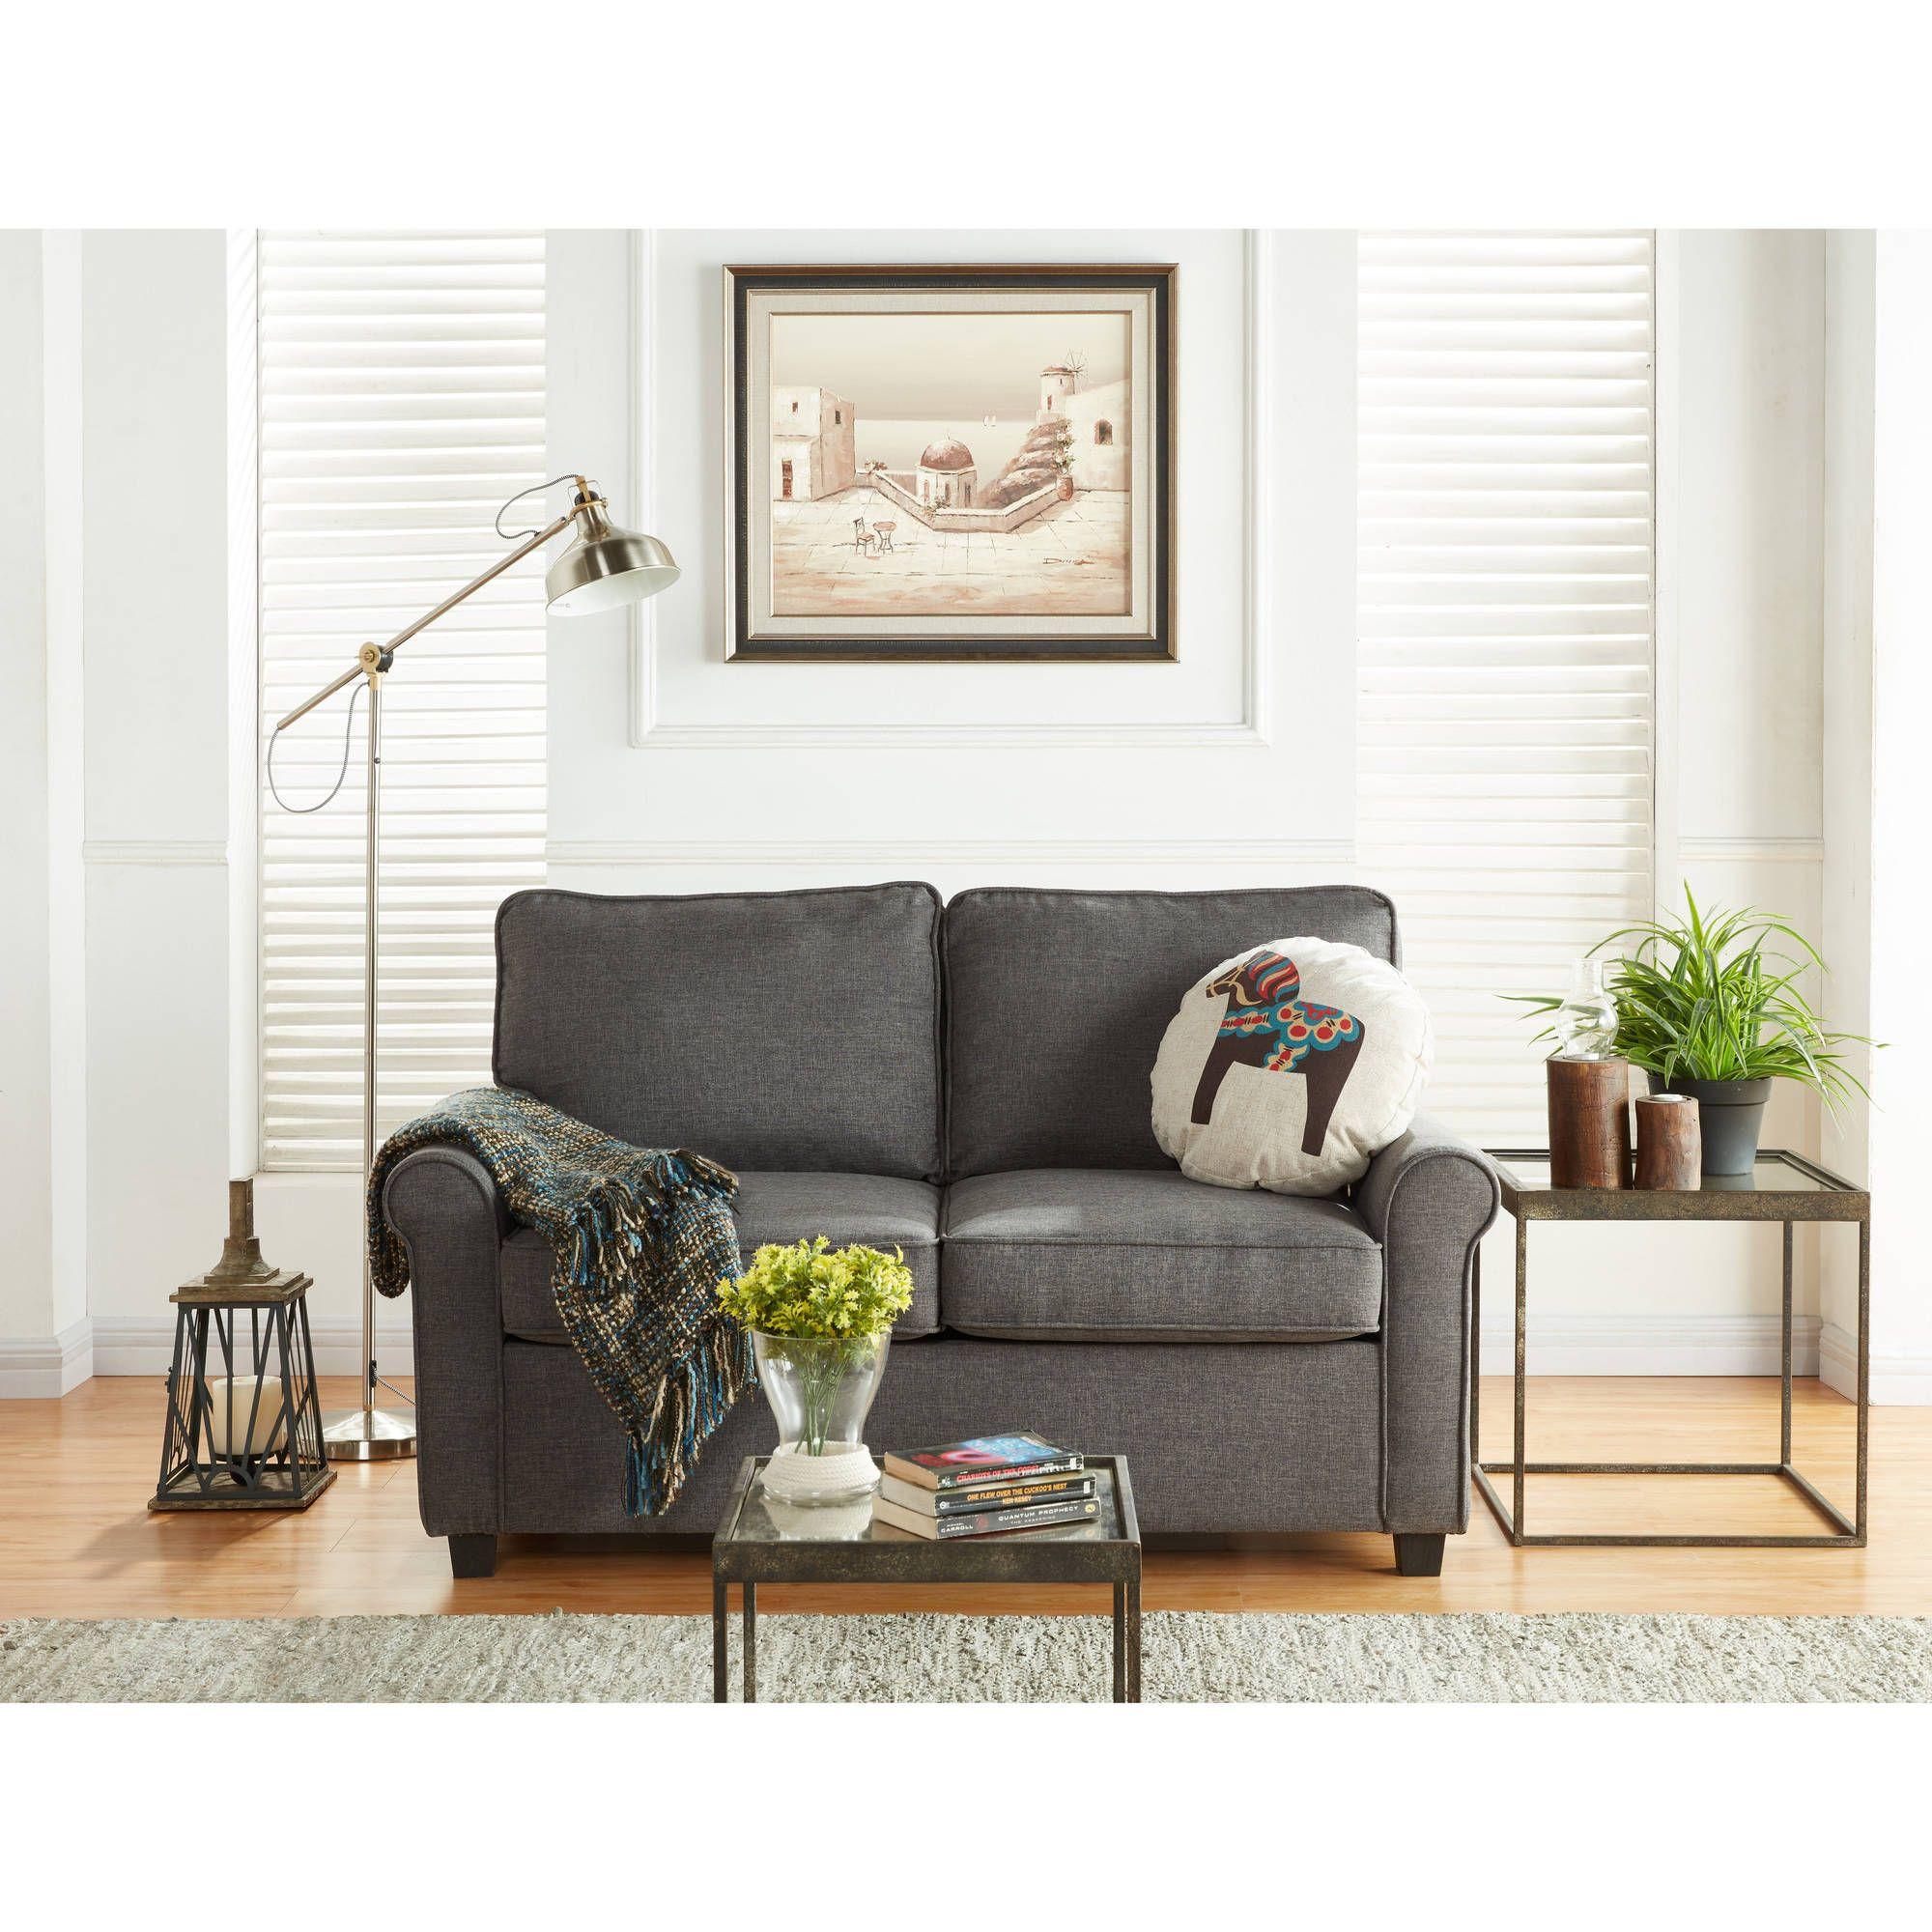 Mainstays Sofa Sleeper With Memory Foam Mattress Grey At